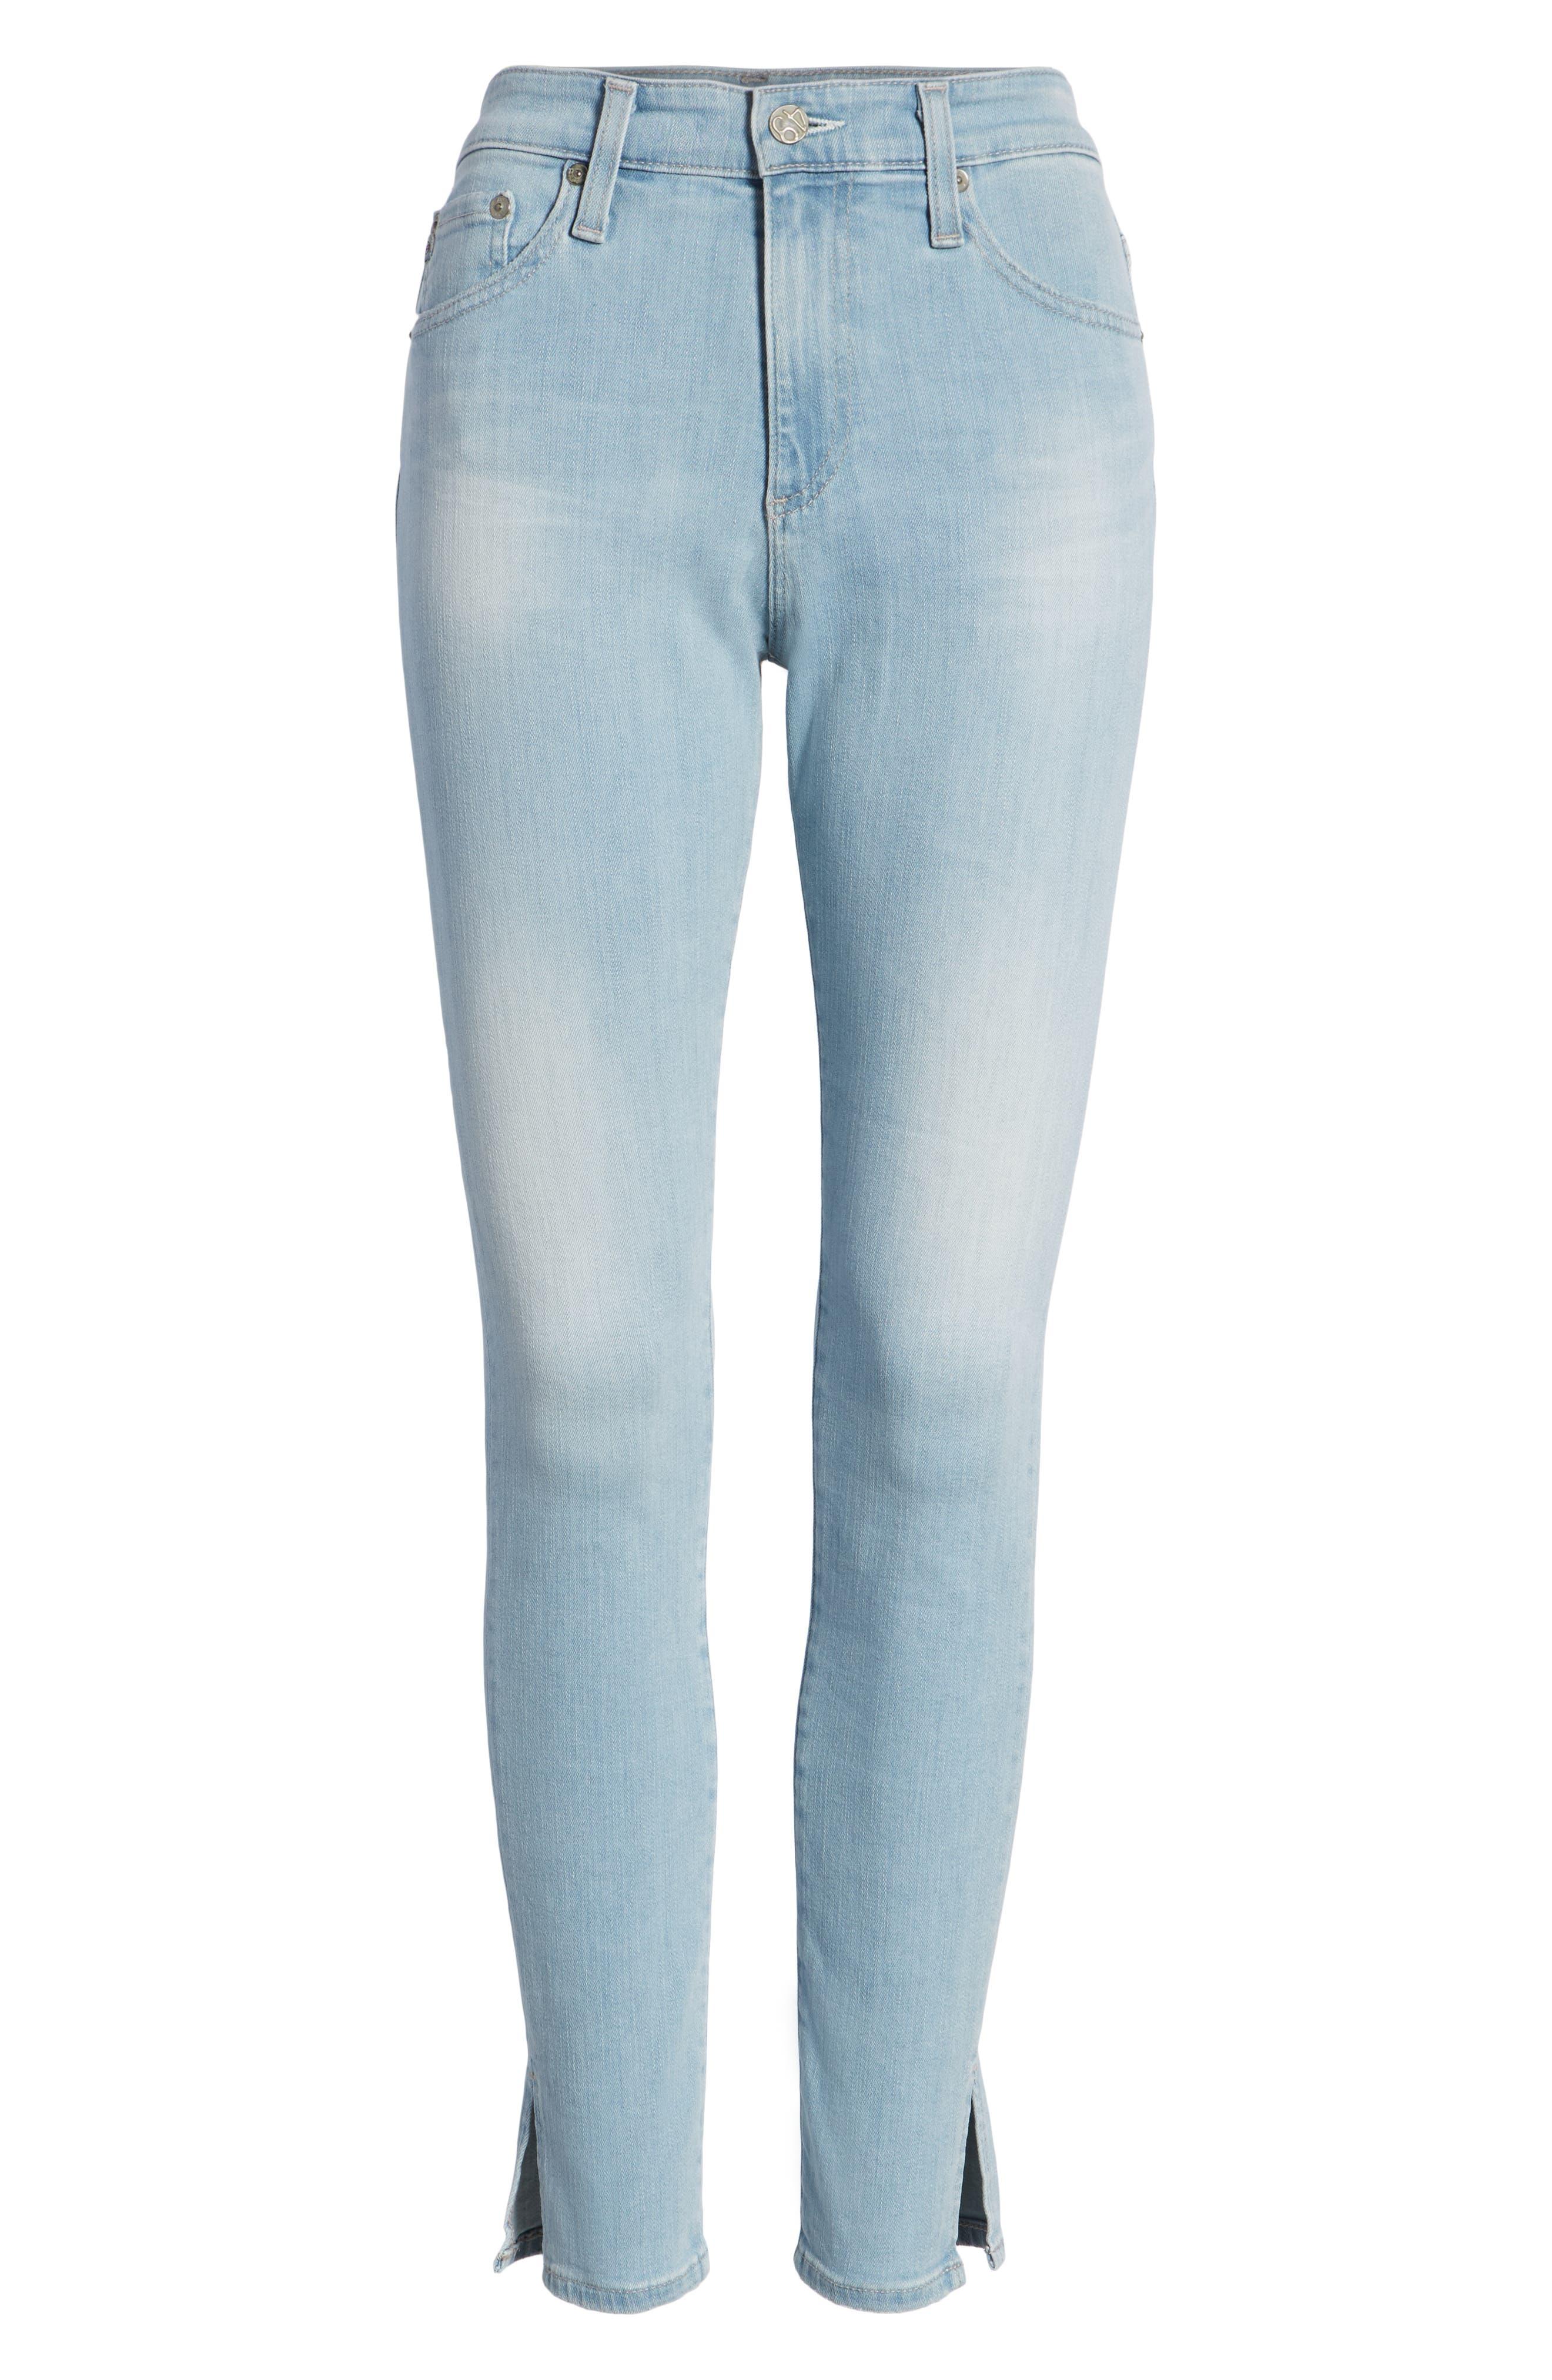 Farrah High Waist Ankle Skinny Jeans,                             Alternate thumbnail 7, color,                             20 Years Sutro